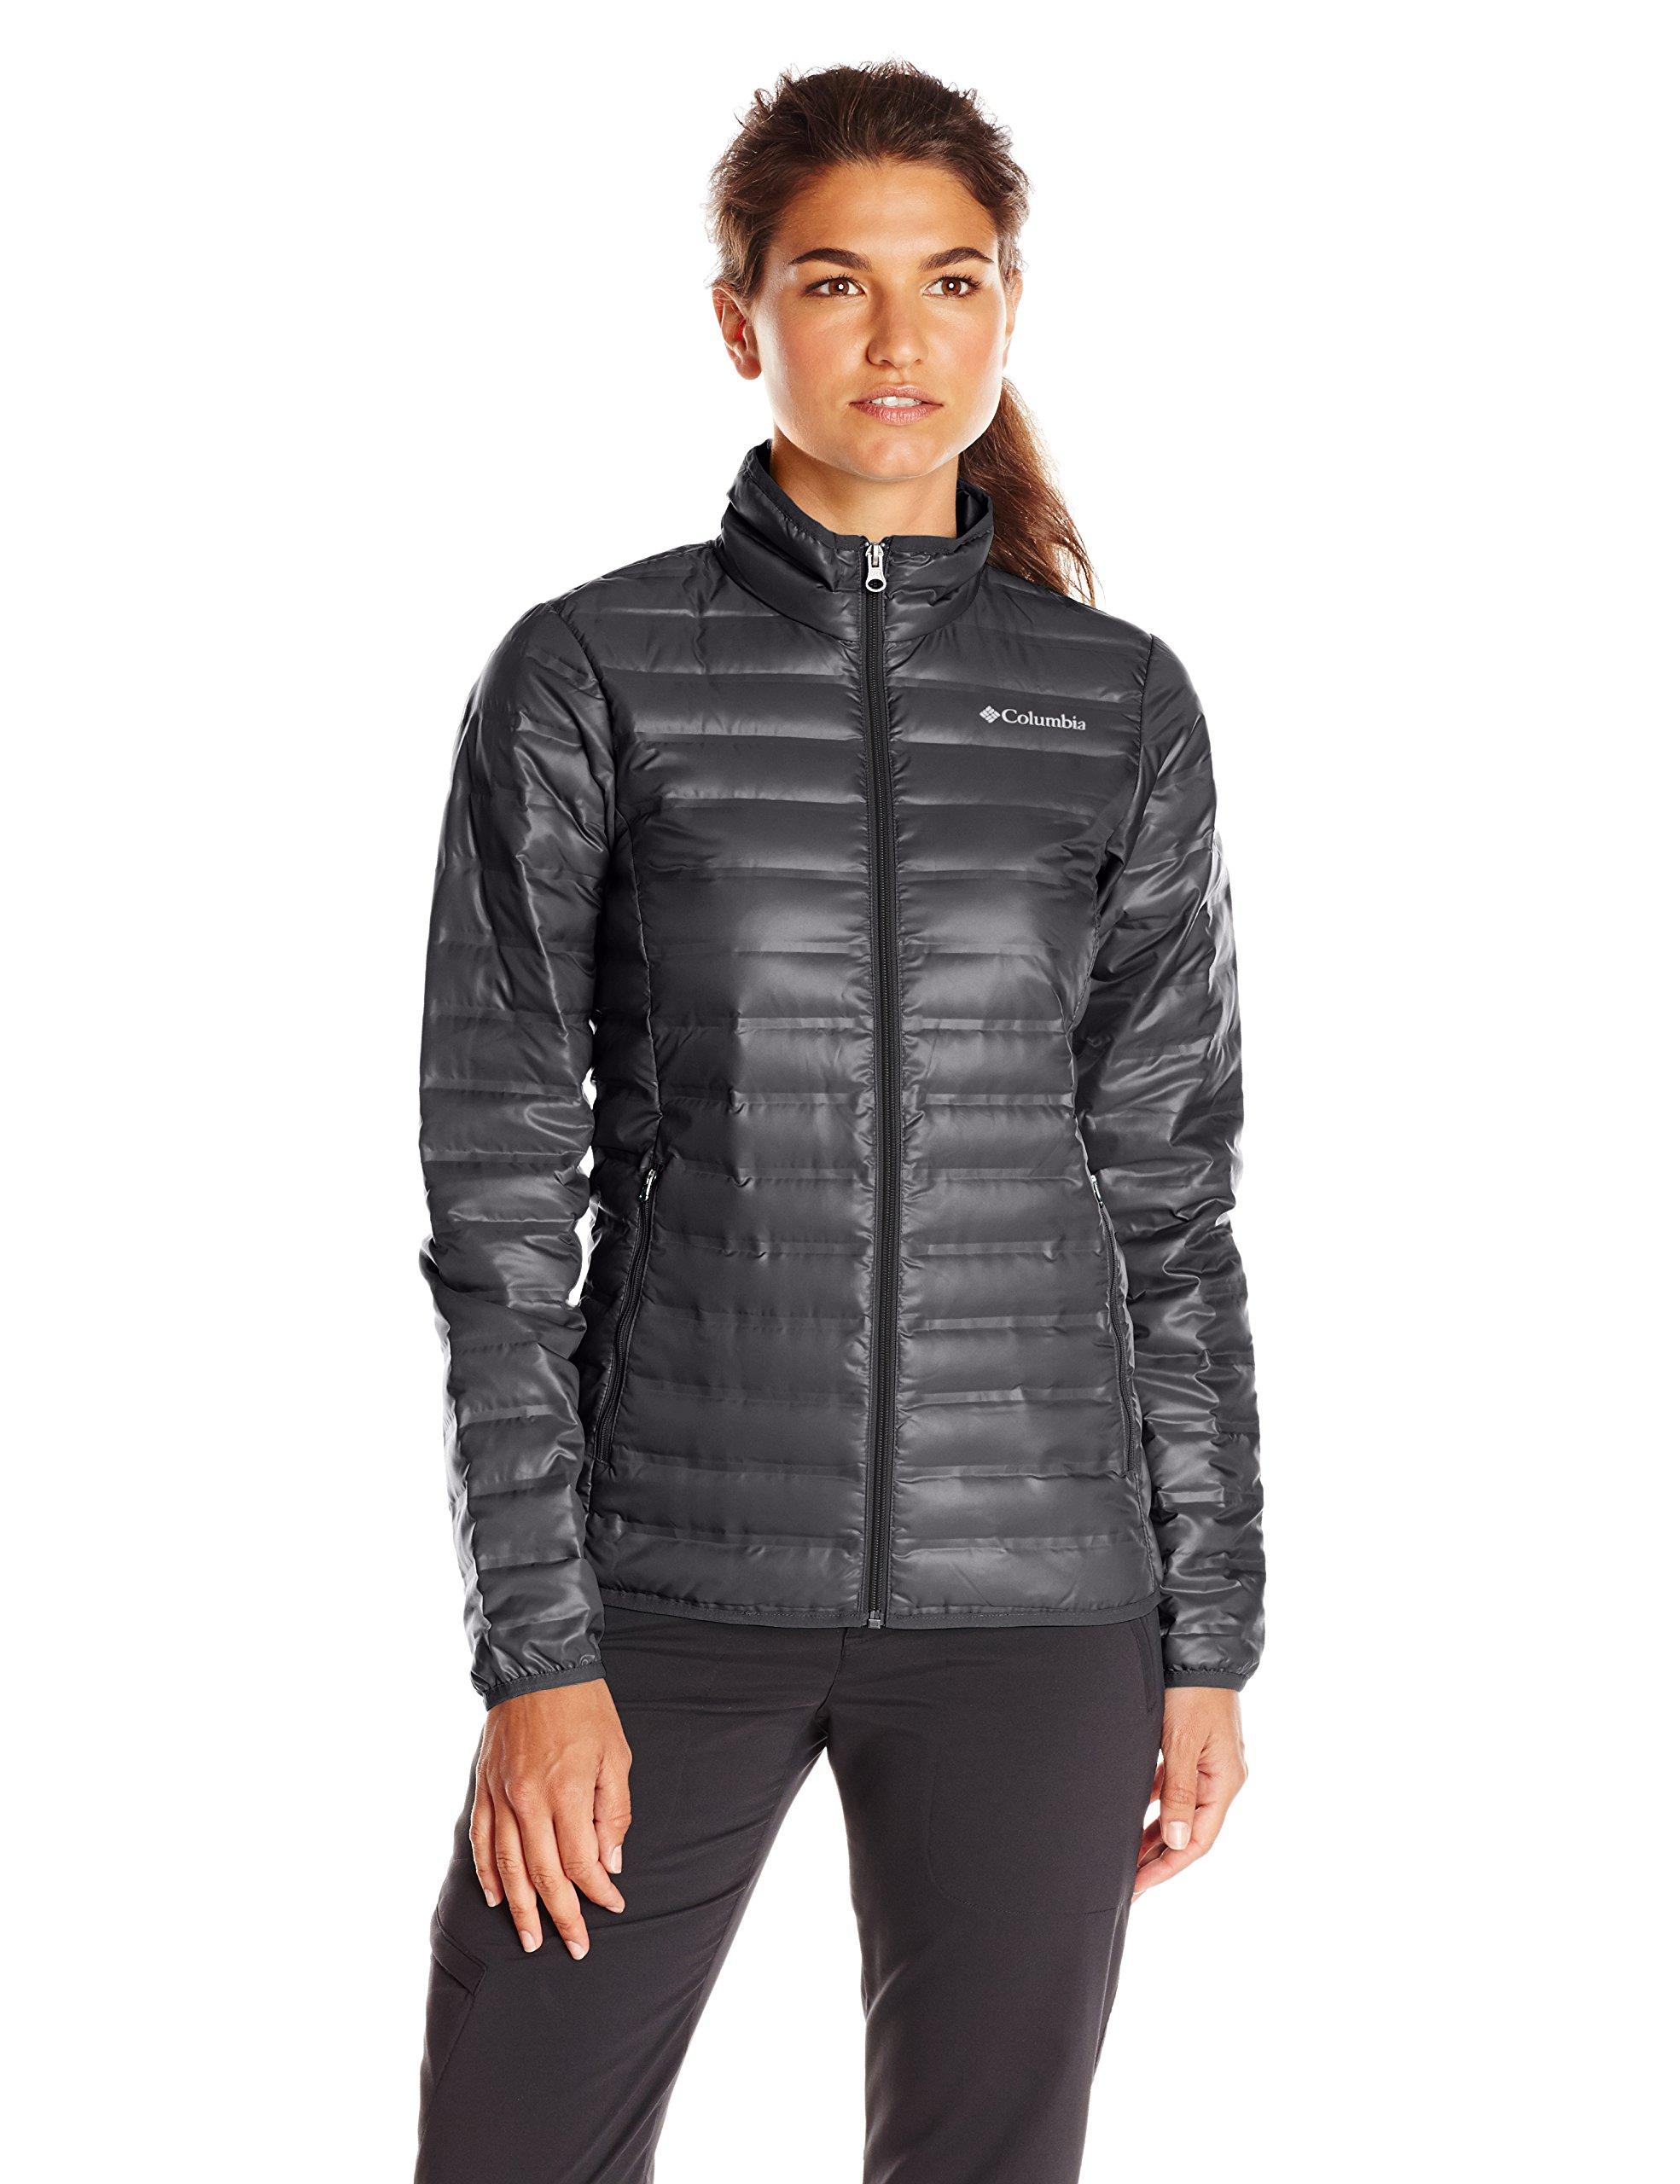 Columbia Women's Flash Forward Down Jacket, Black, Small